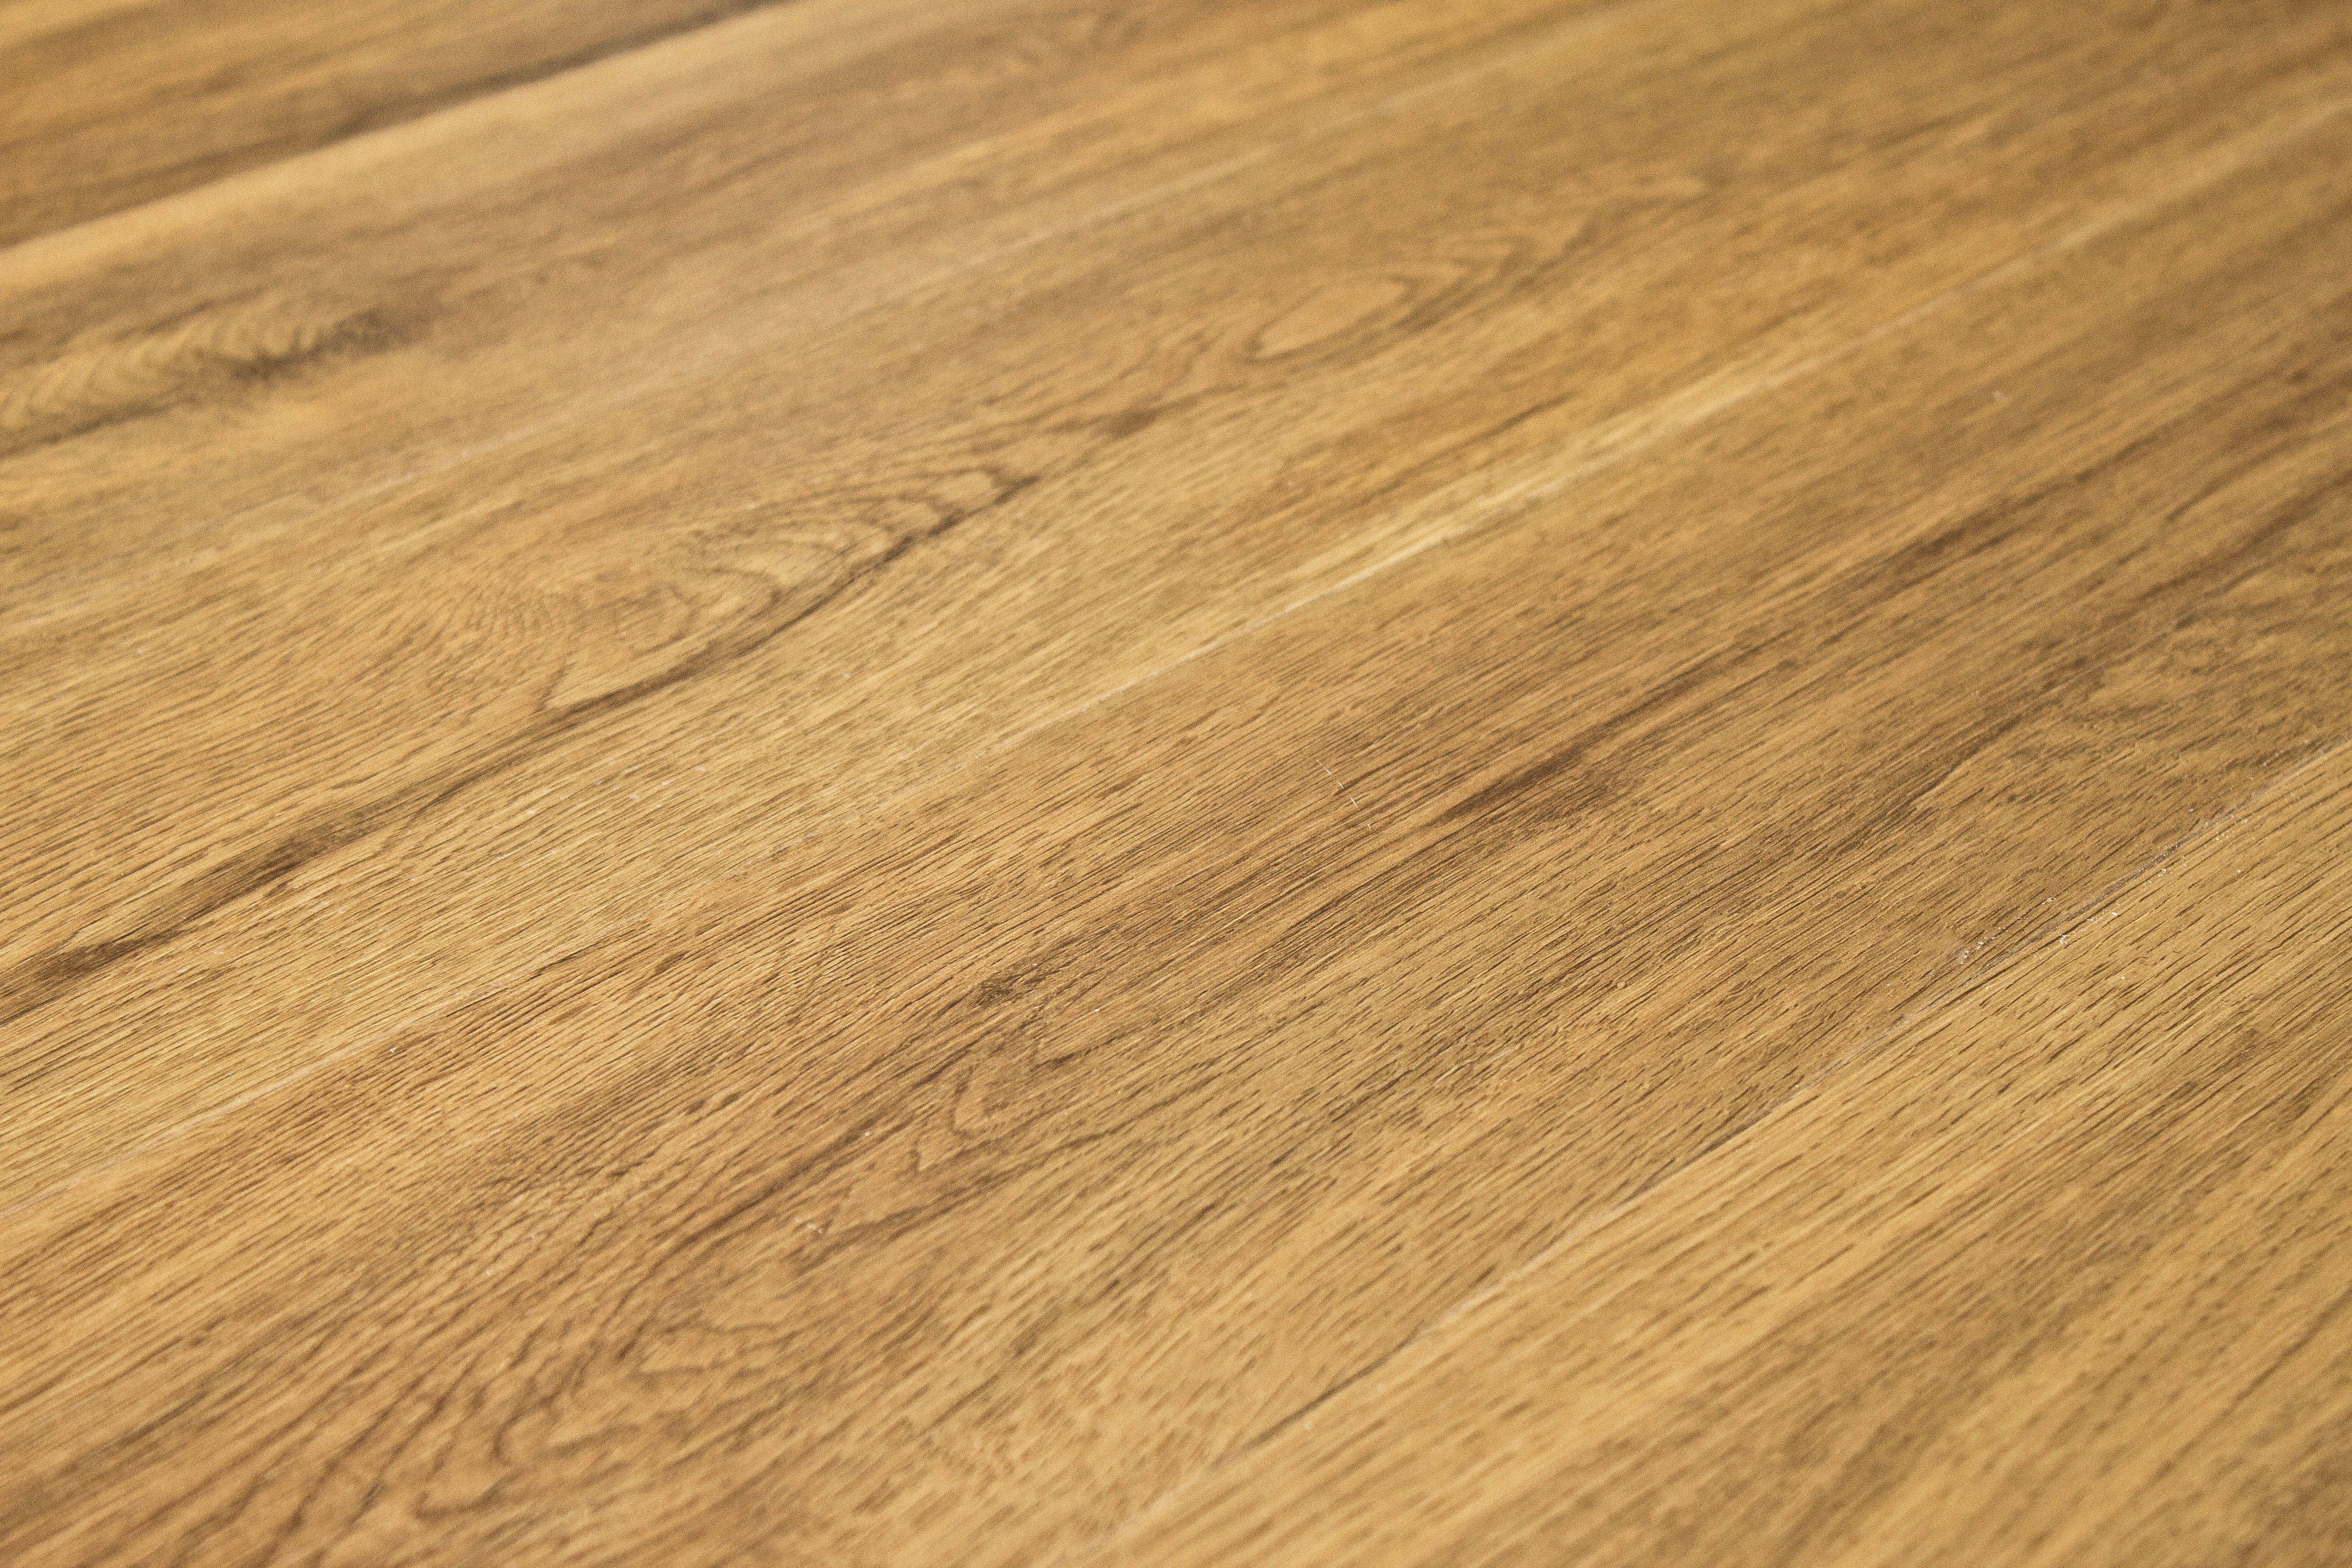 Berry/Alloc DreamClick Pro Palmer Oak Natural 0065969 Luxury Vinyl Flooring